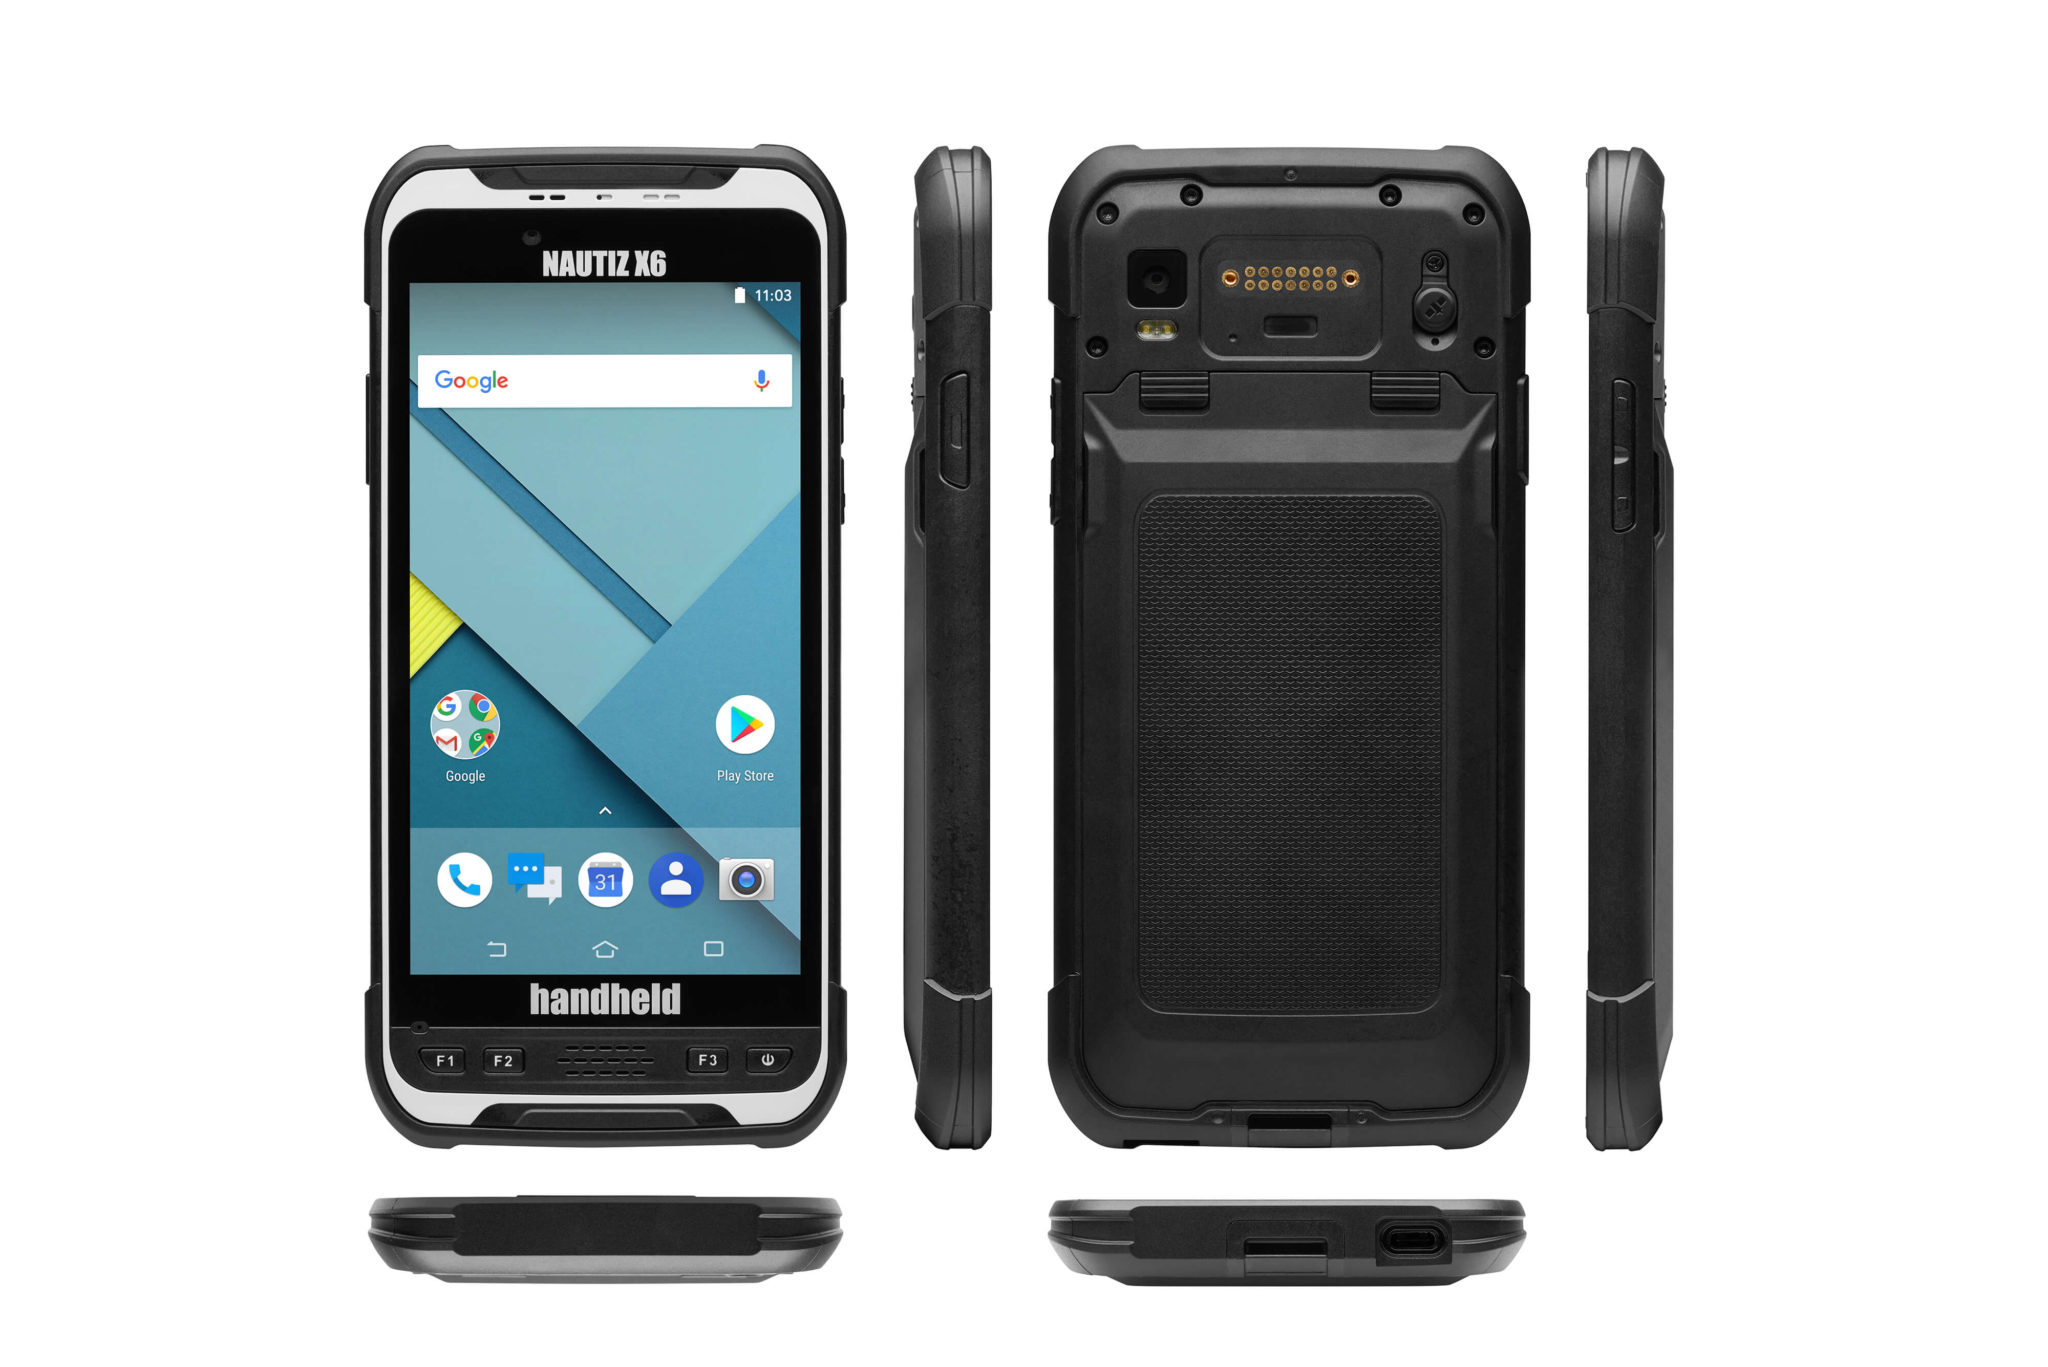 Nautiz-X6-handheld-rugged-phablet-every-angle